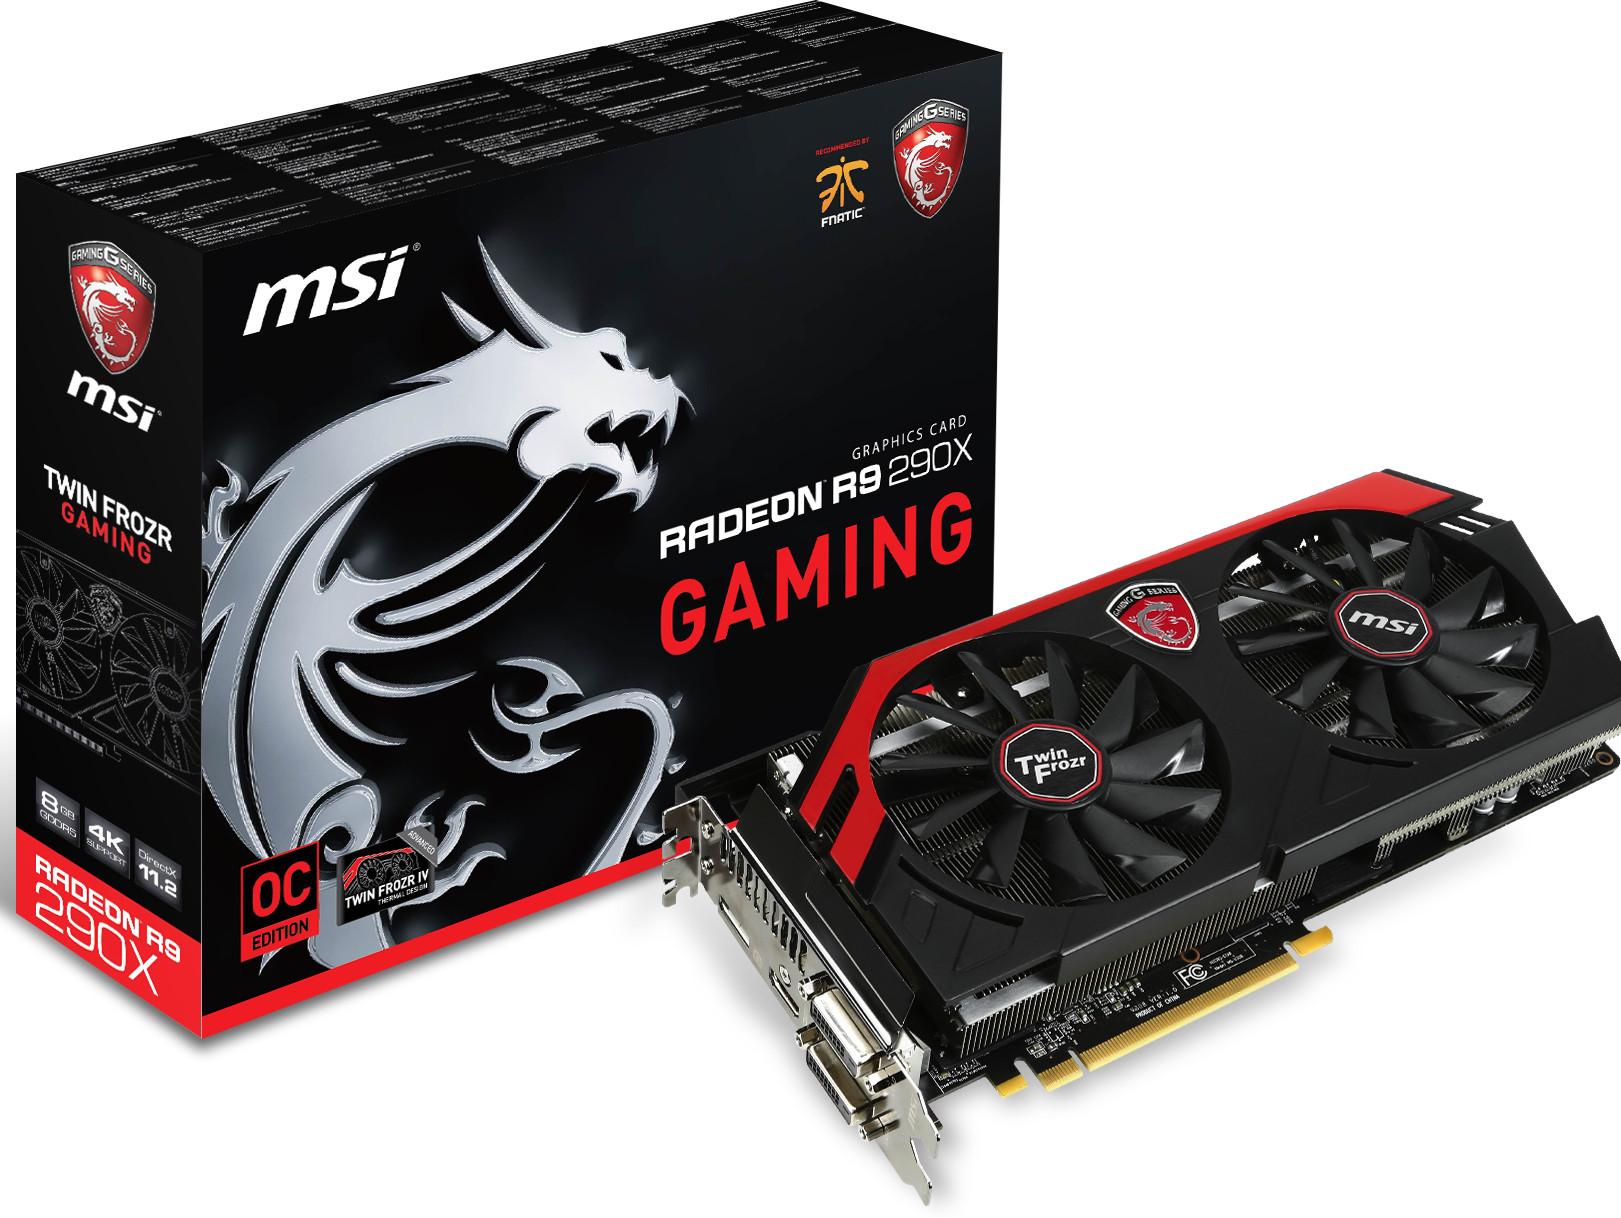 MSI Announces Radeon R9 290X Gaming 8GB Graphics Card techPowerUp ldINxaP5